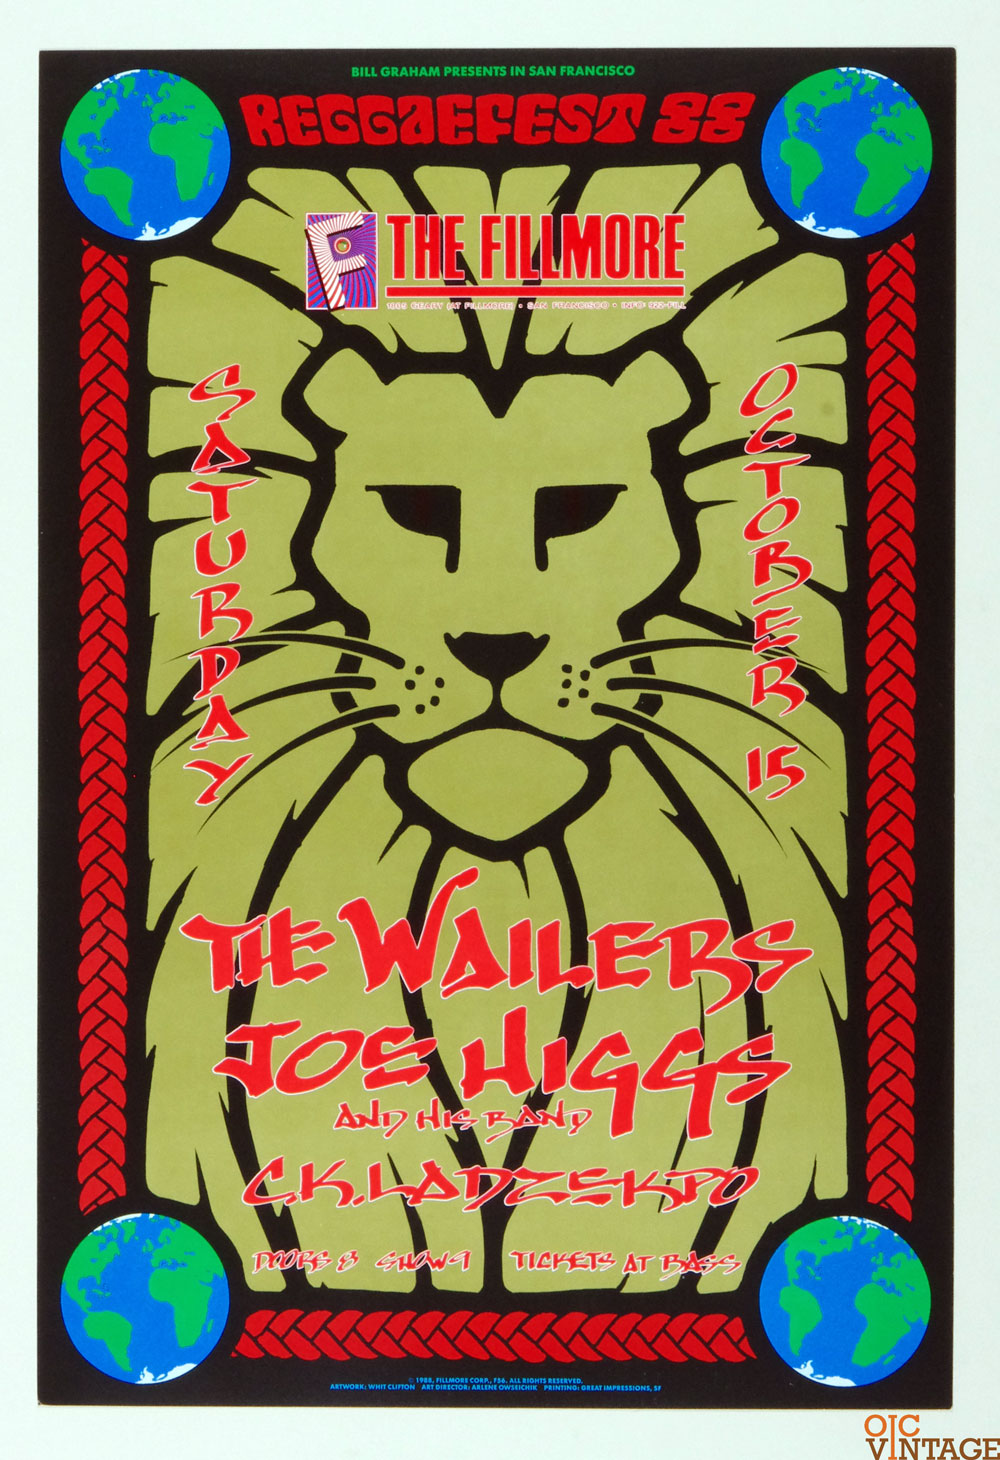 New Fillmore F056 Poster The Wailers Joe Higgs 1988 Oct 15